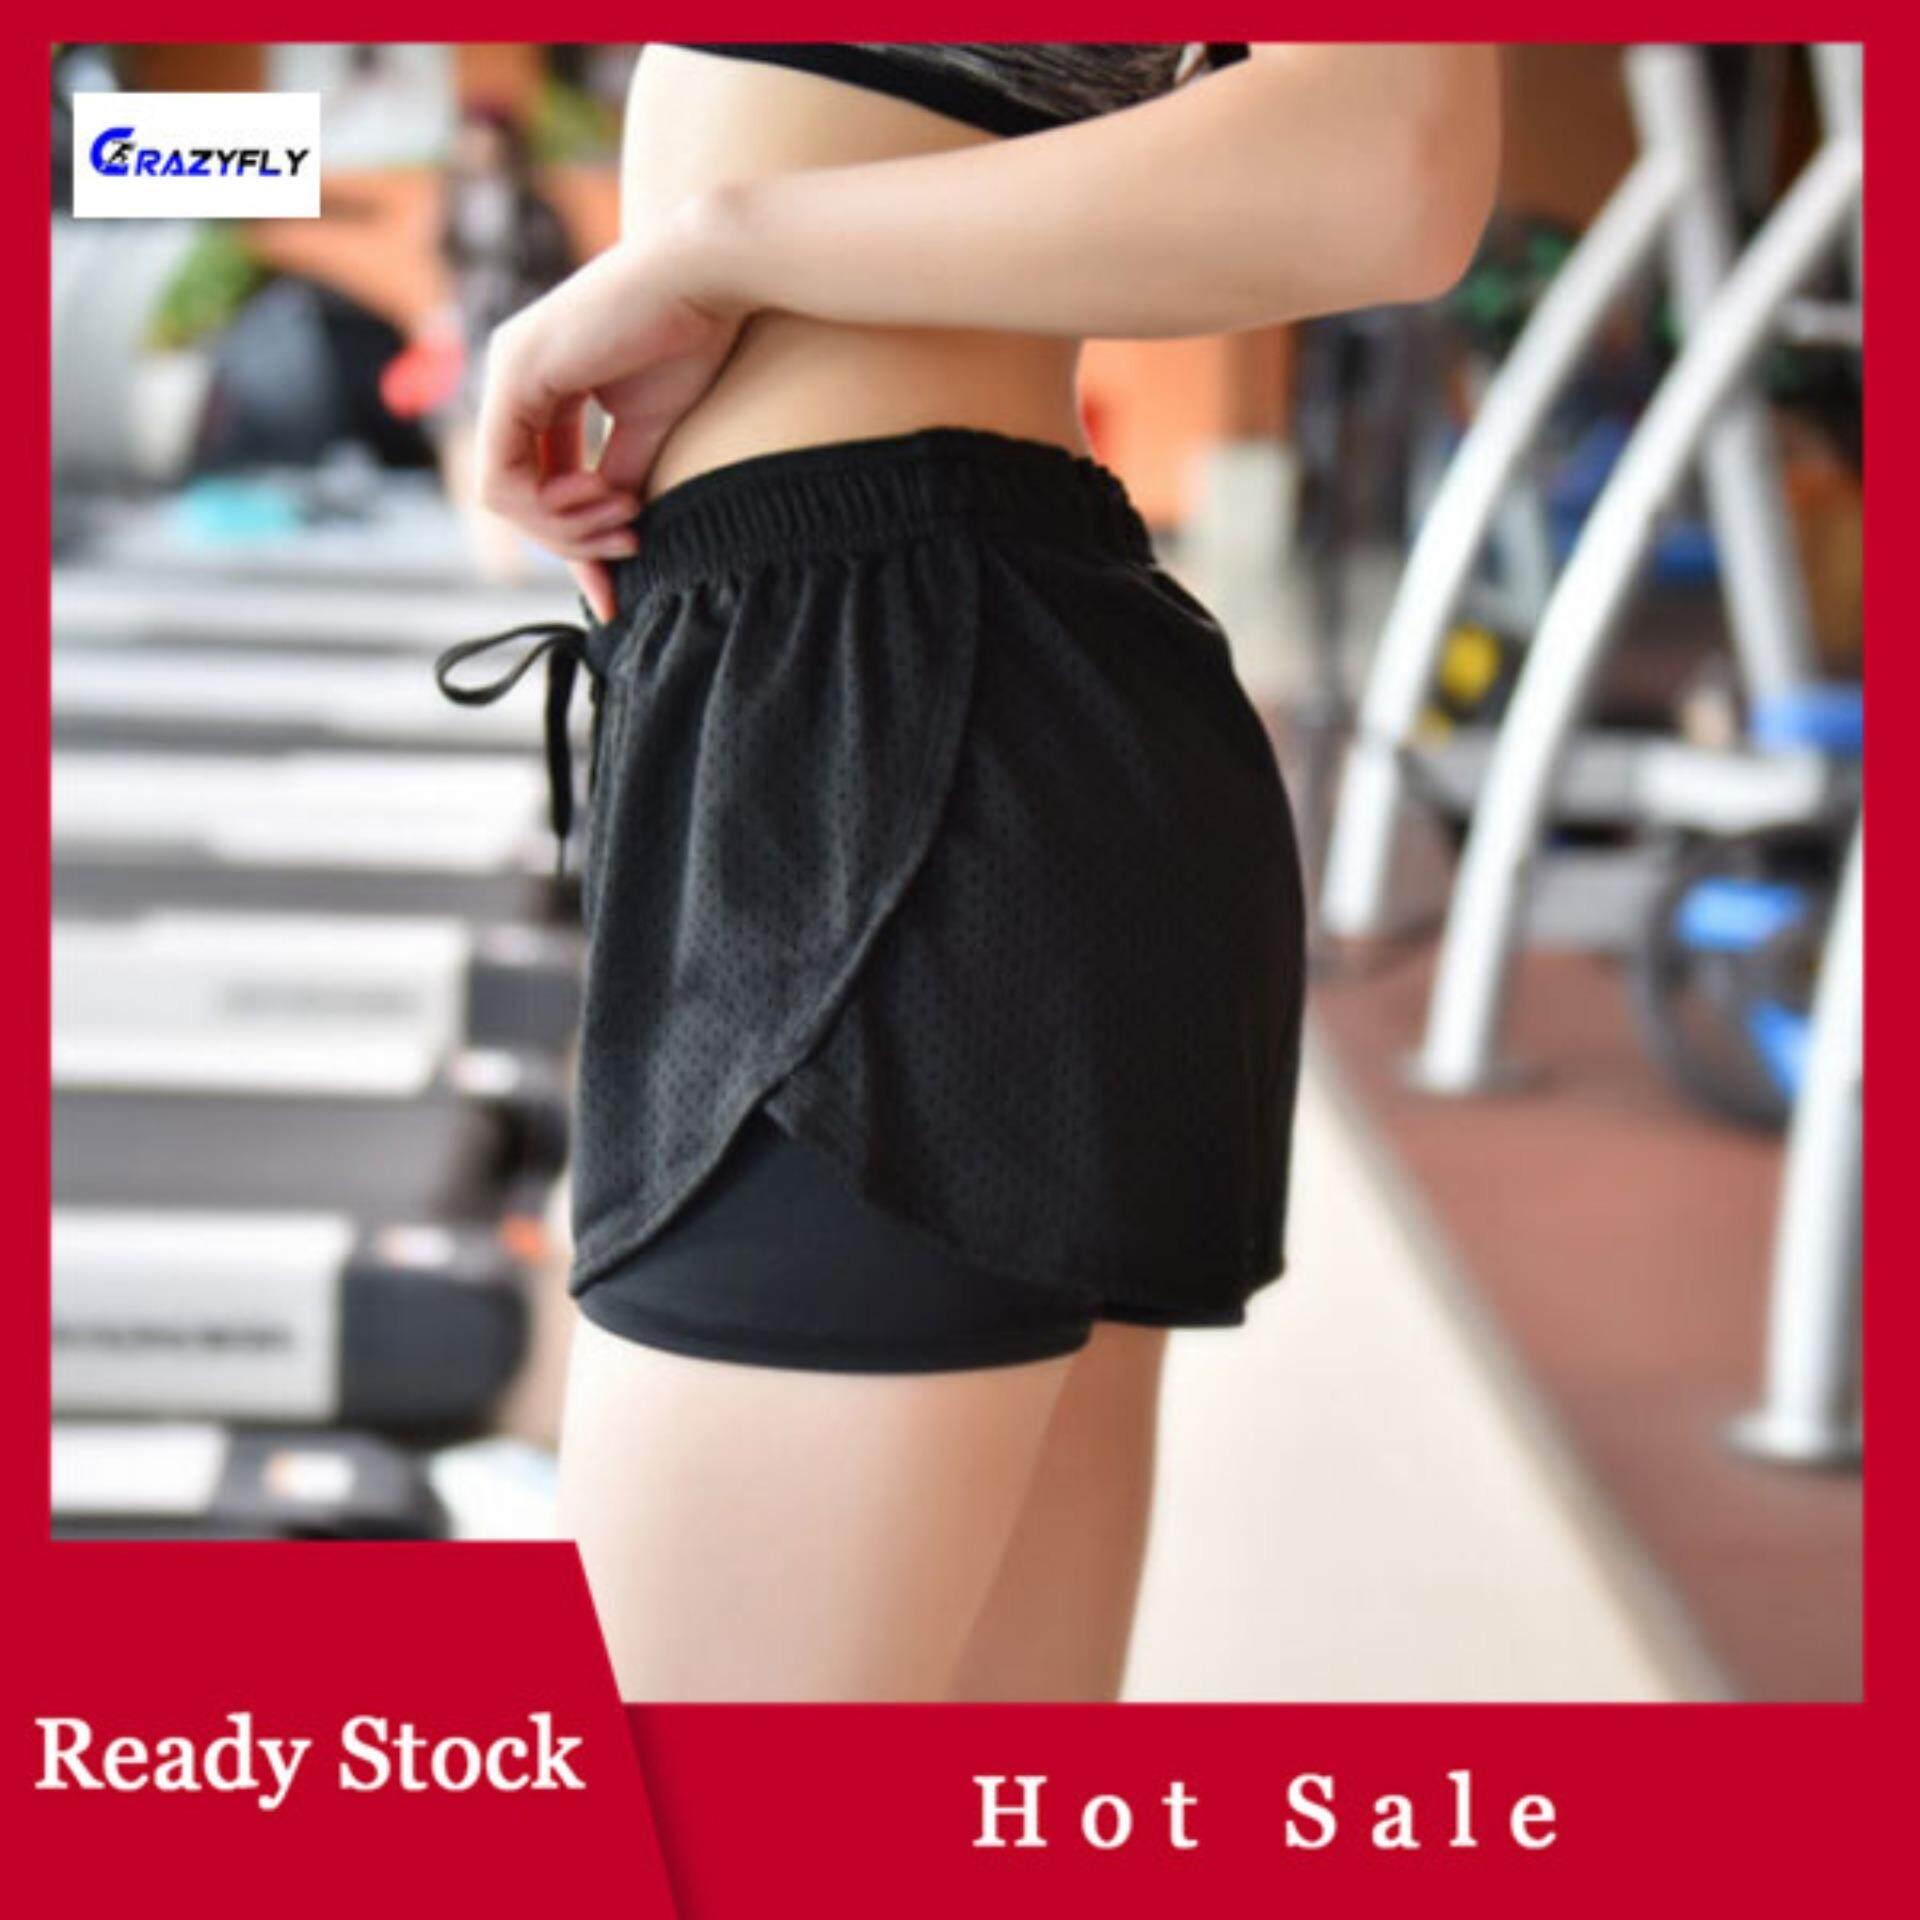 ae3cbf3109d004 Crazyfly Women Sport Fitness Yoga Shorts 2 In 1 Quick Dry Athletic Running  Jogging Elastic Waist